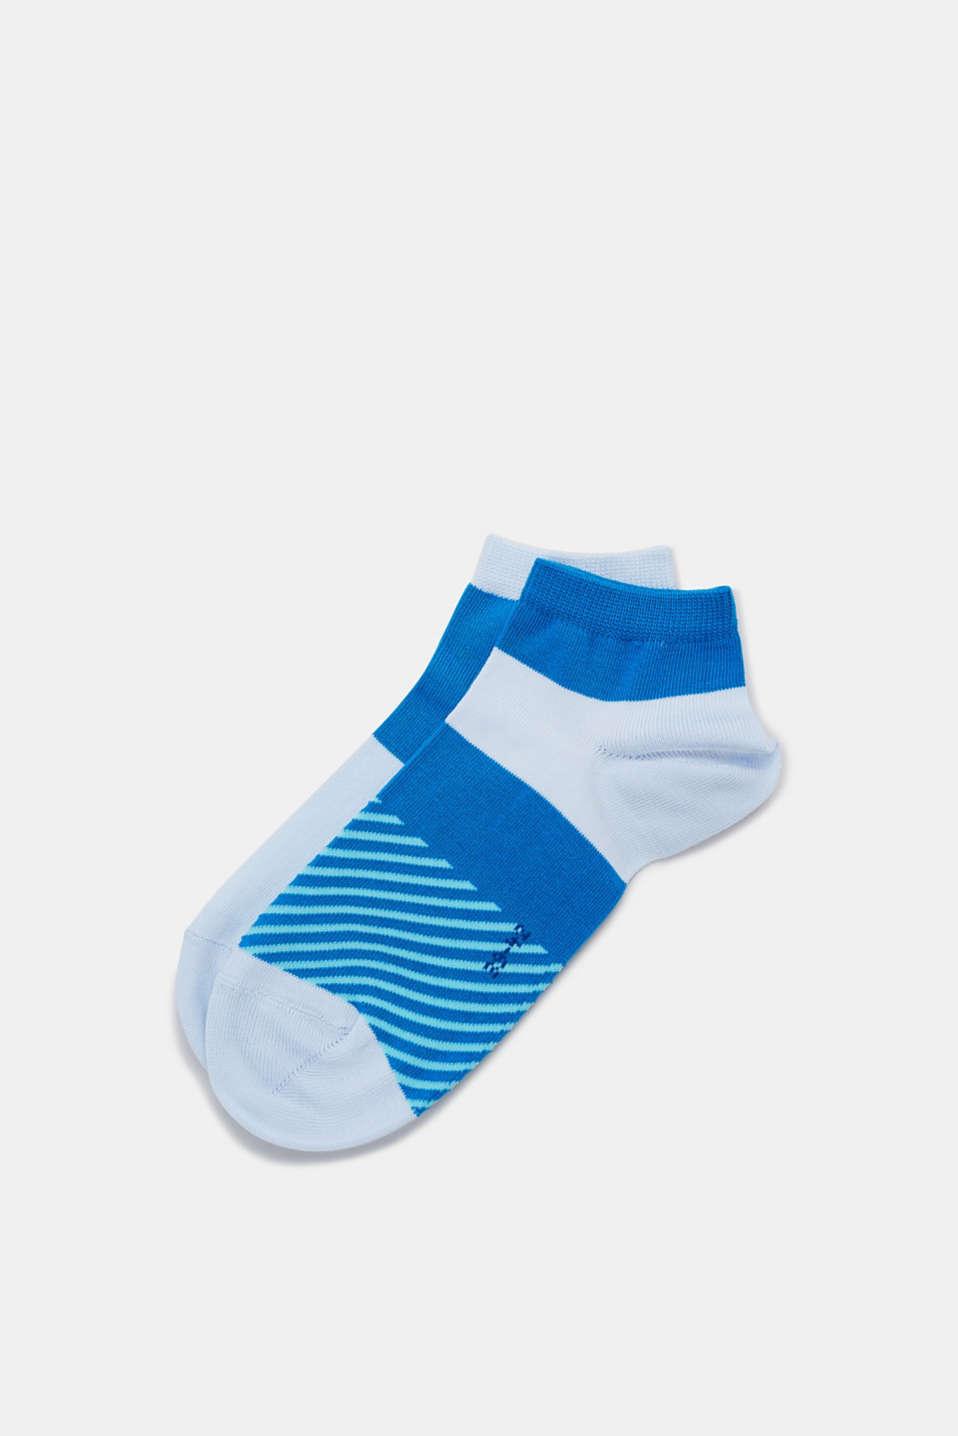 Sneaker socks, MANGANESE BLUE, detail image number 0